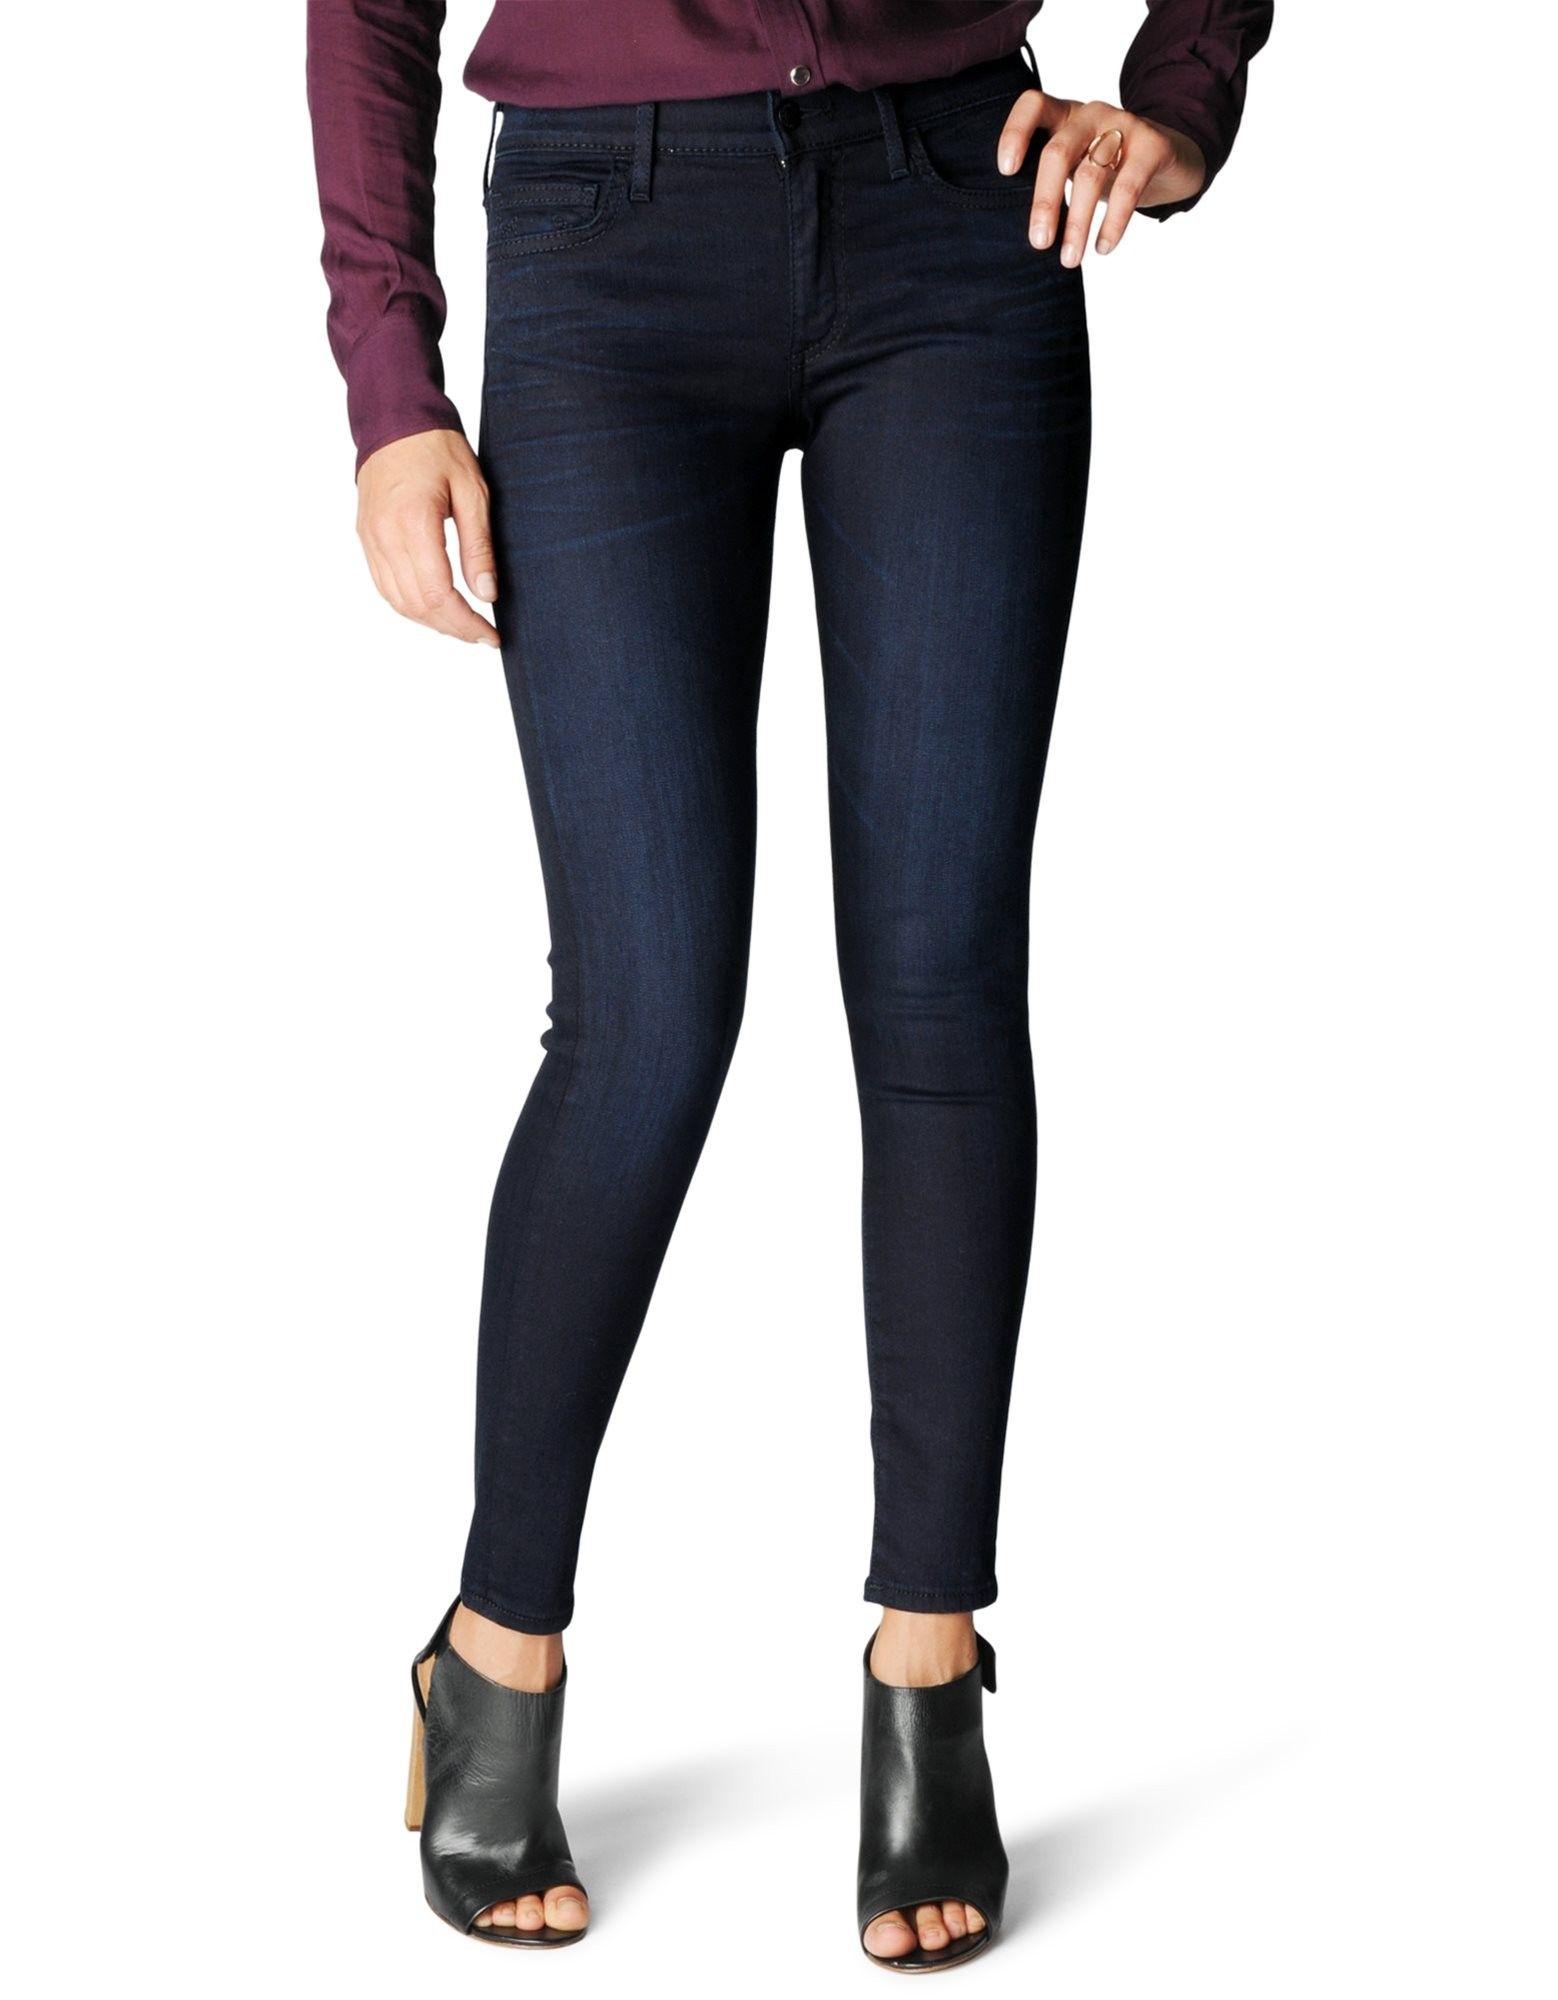 Womens Halle Zip Black Denim Skinny Jeans True Religion JiILo8